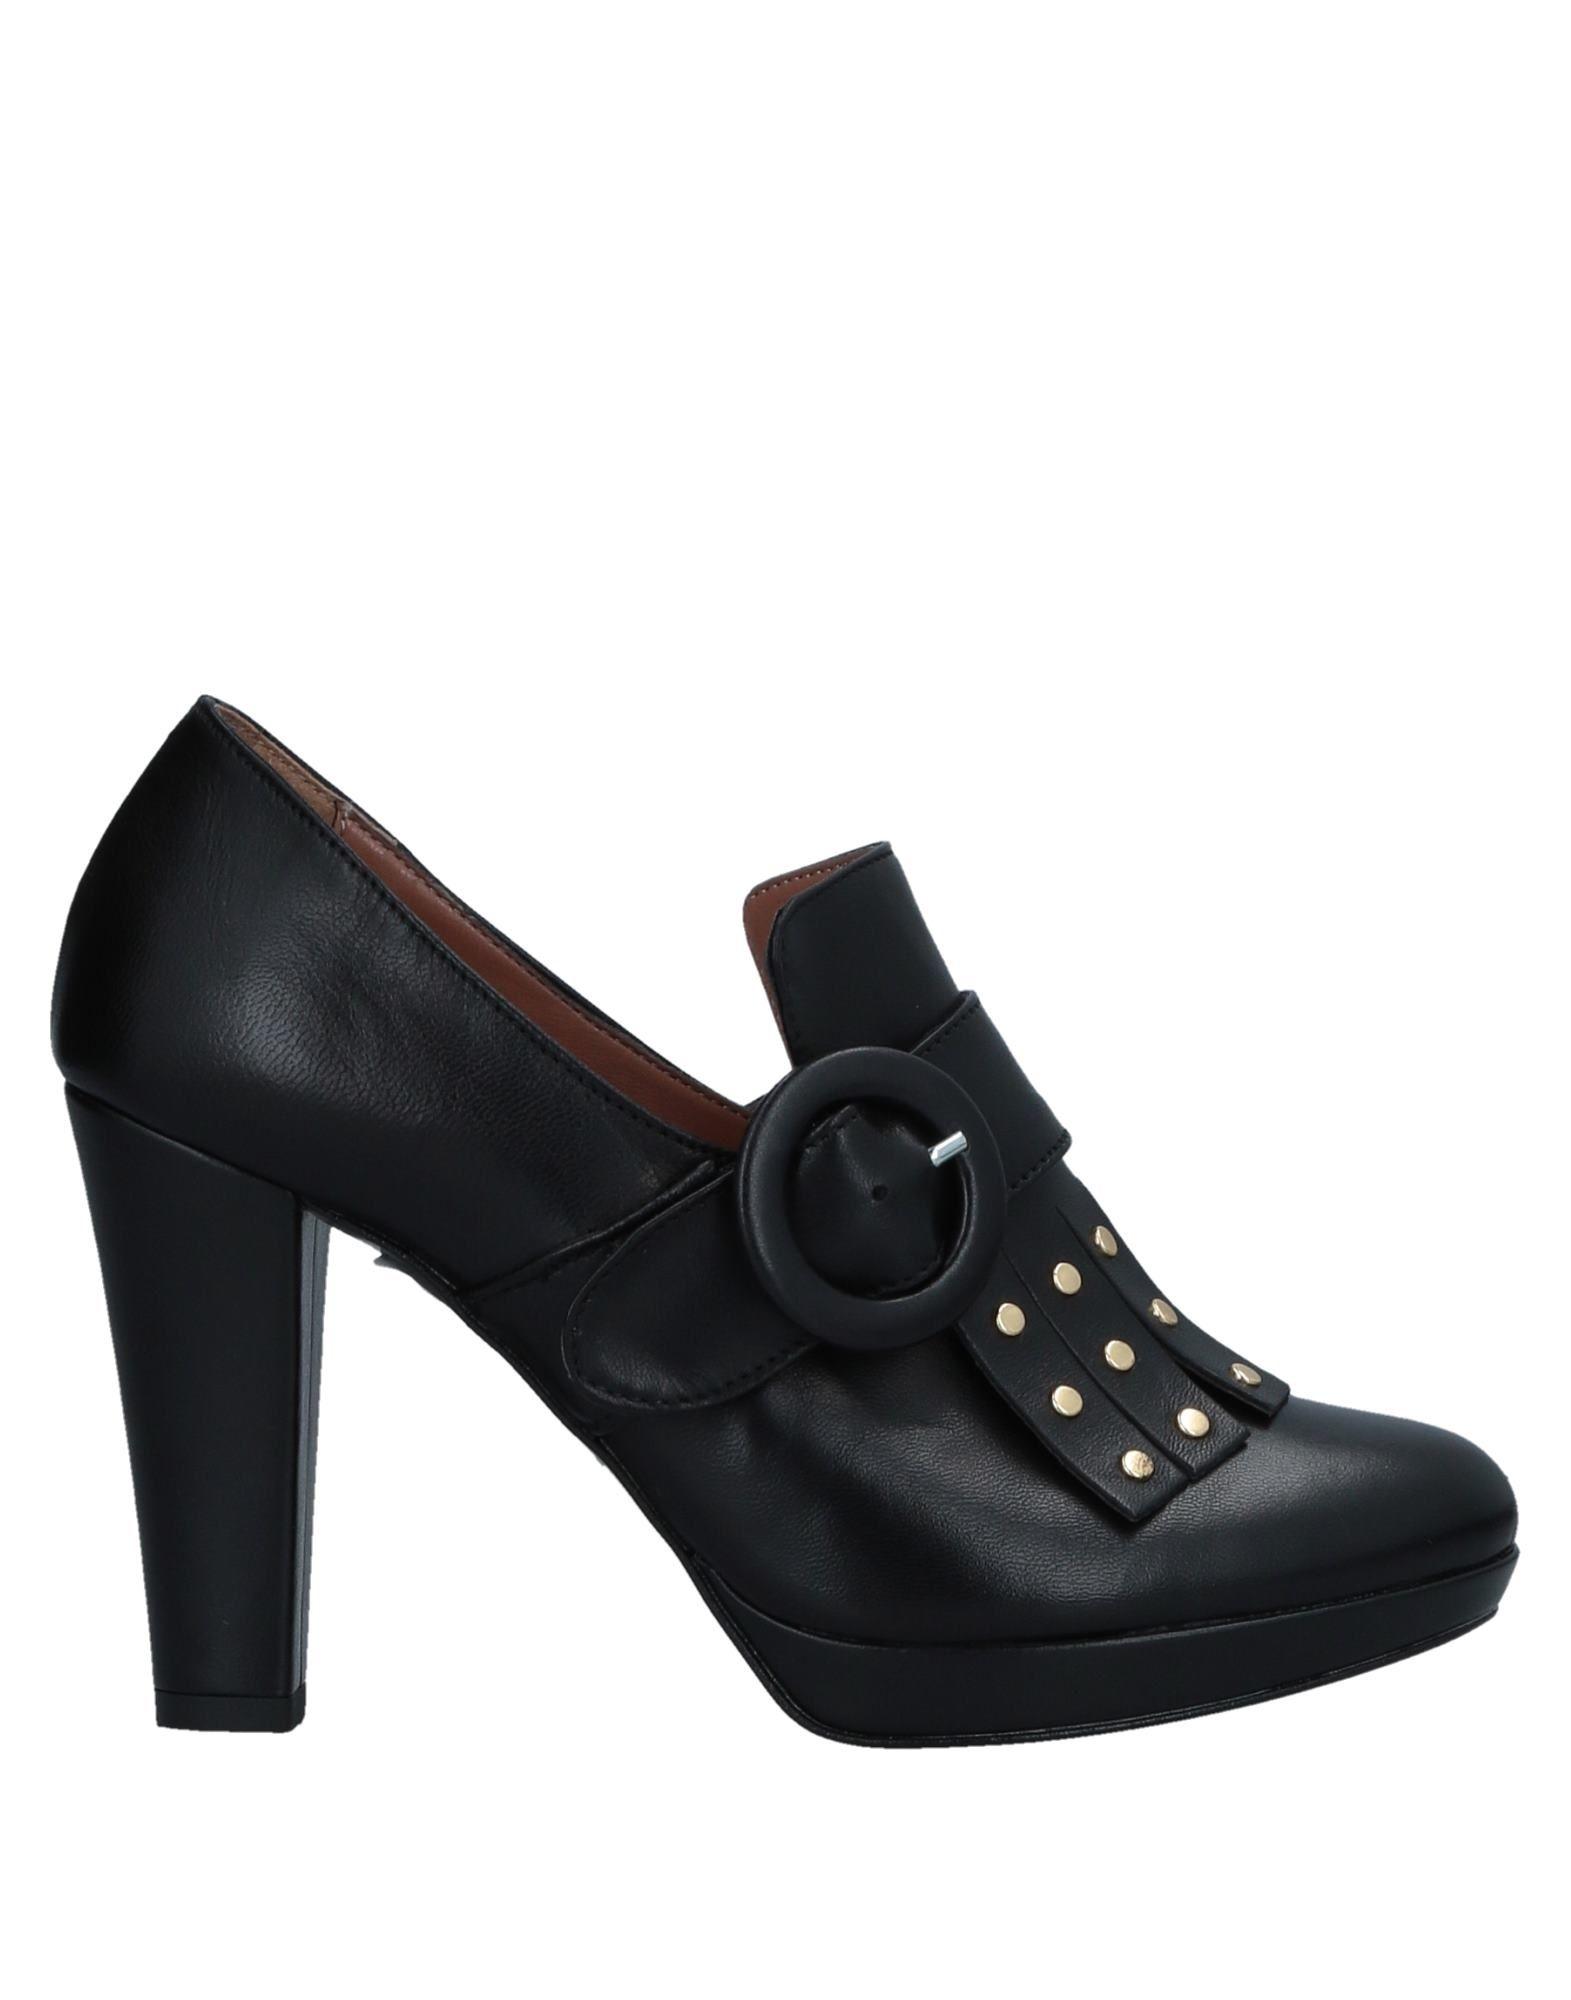 Eliana Eliana Eliana Bucci Mokassins Damen  11532204KM Gute Qualität beliebte Schuhe 2c336f